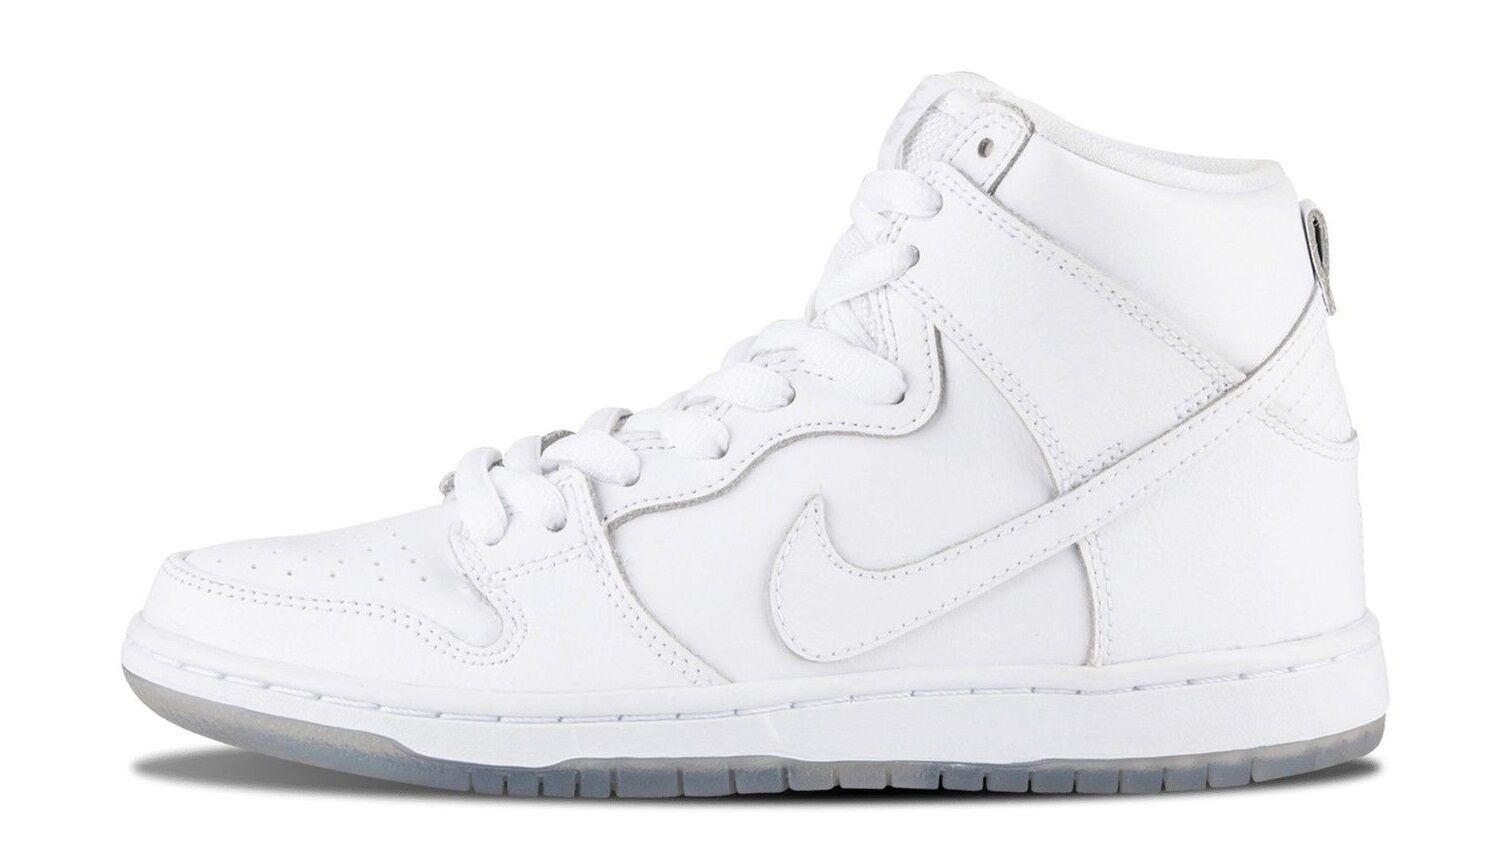 Nike DUNK HIGH PRO SB White-White Light Base Grey 305050-113 (520) Men's Shoes